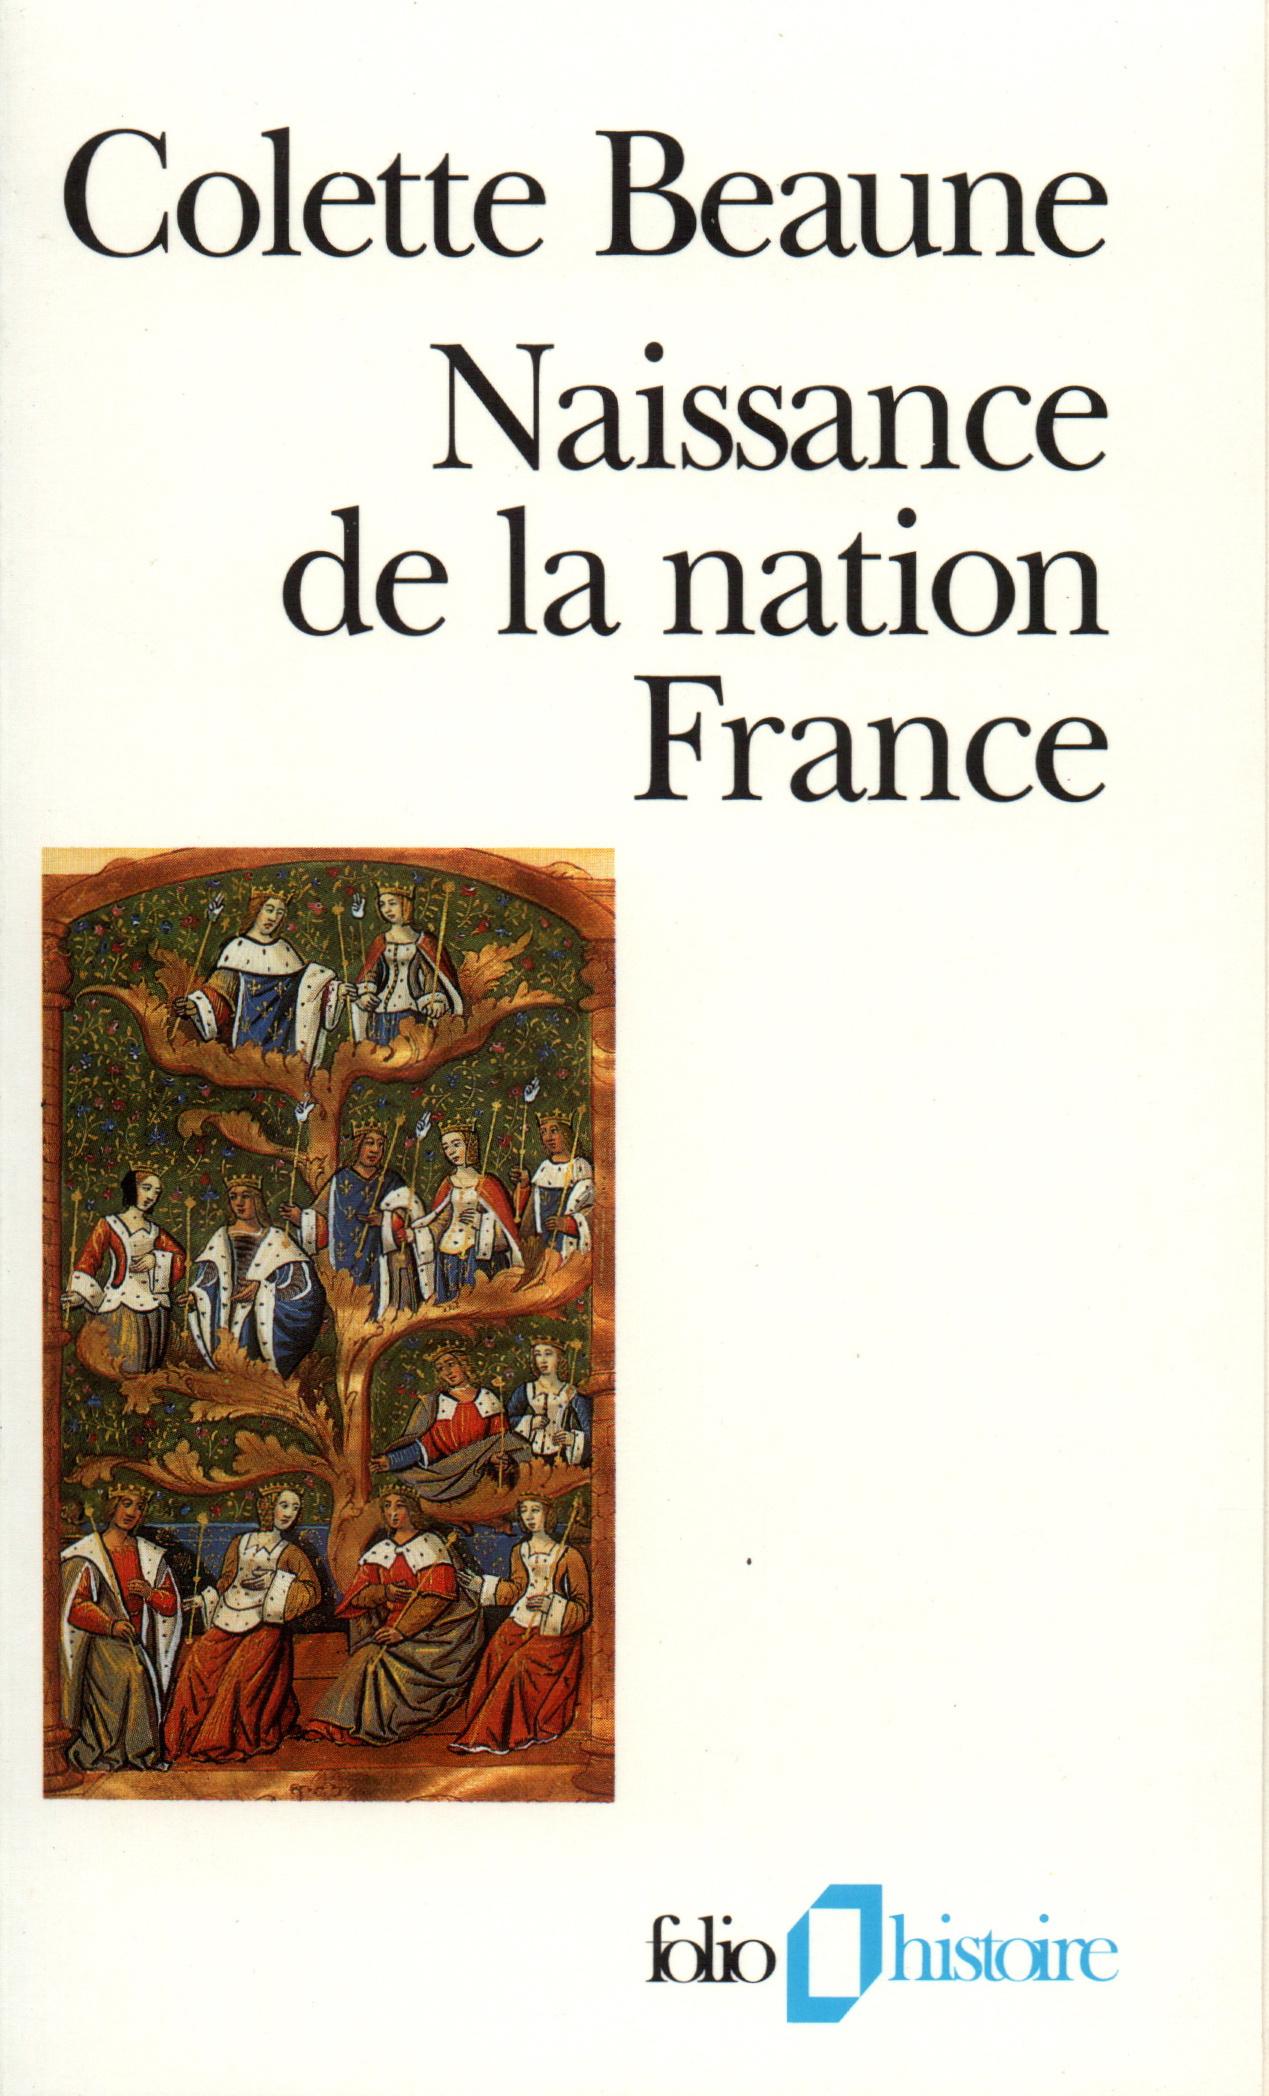 Naissance de la nation France, 1985.jpg